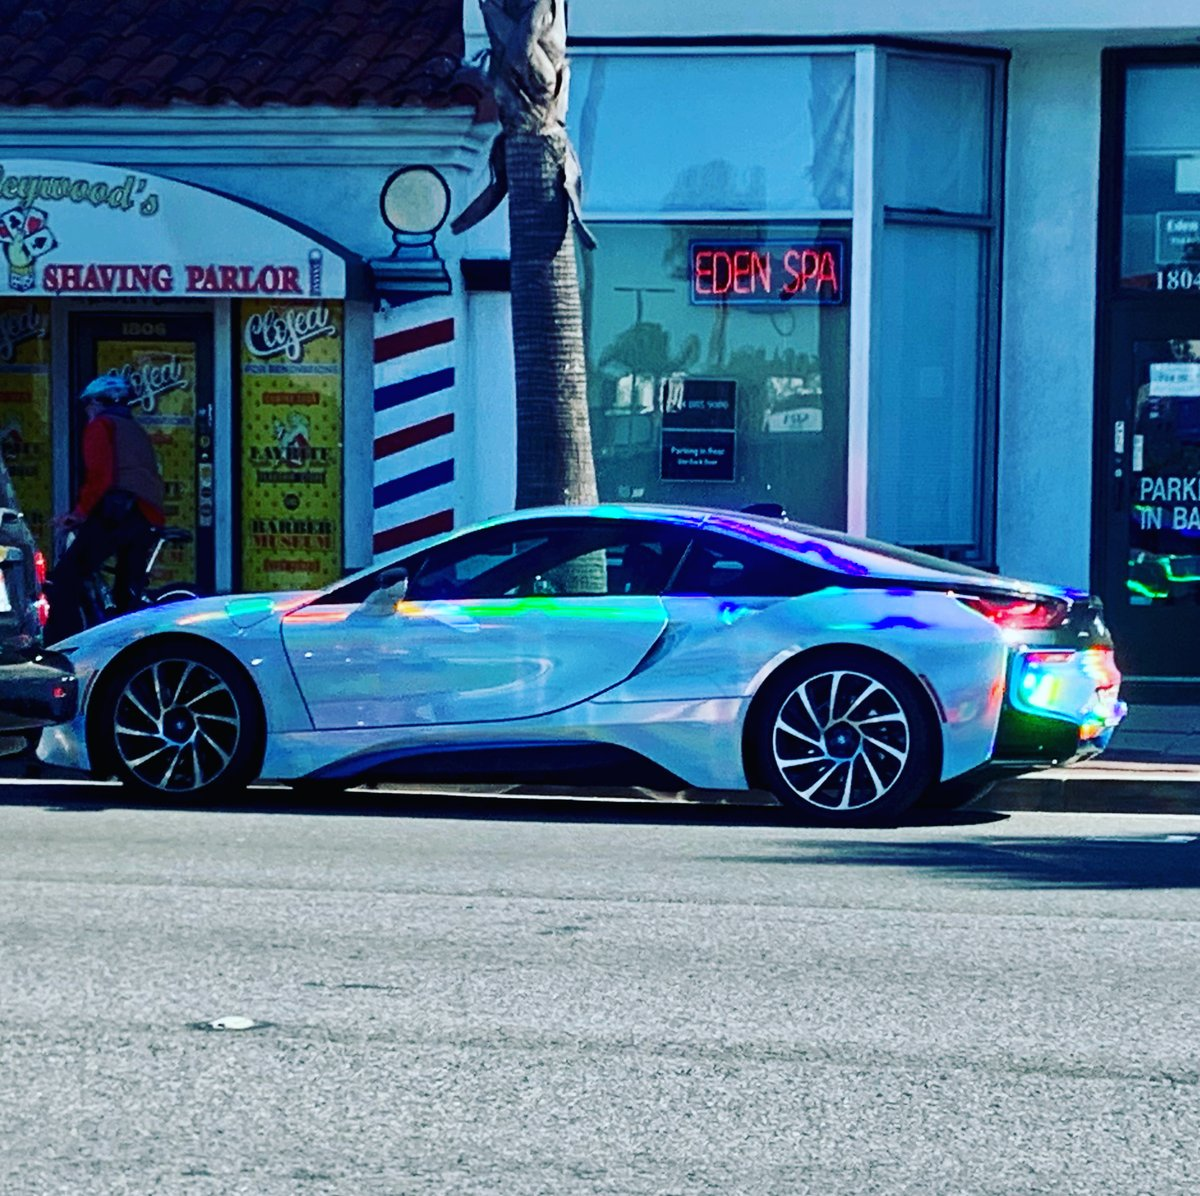 #halographicVinyl #holographicPaint #BMWi8